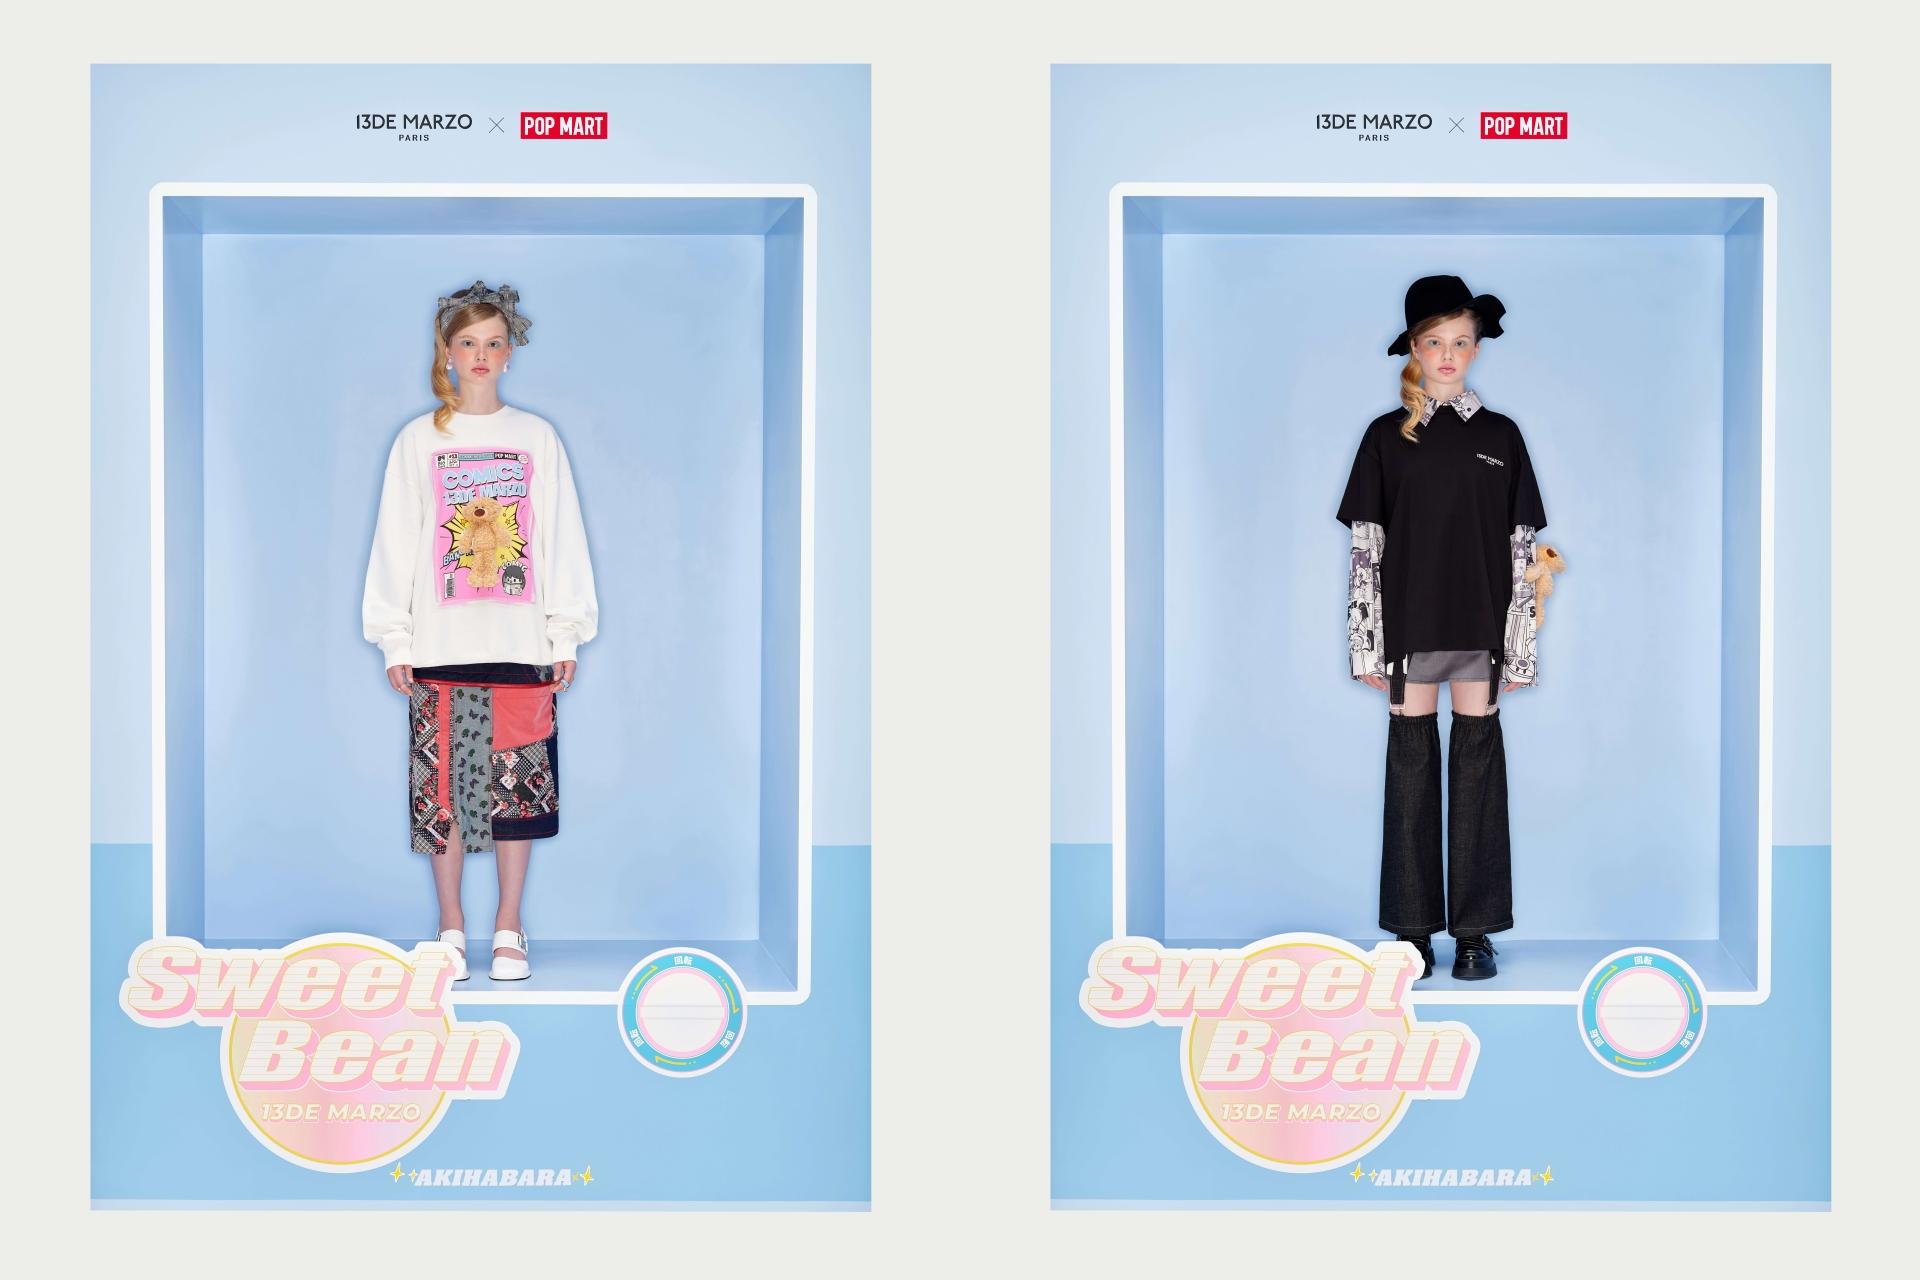 13DE MARZO 携手 POP MART 共同推出联名服饰系列